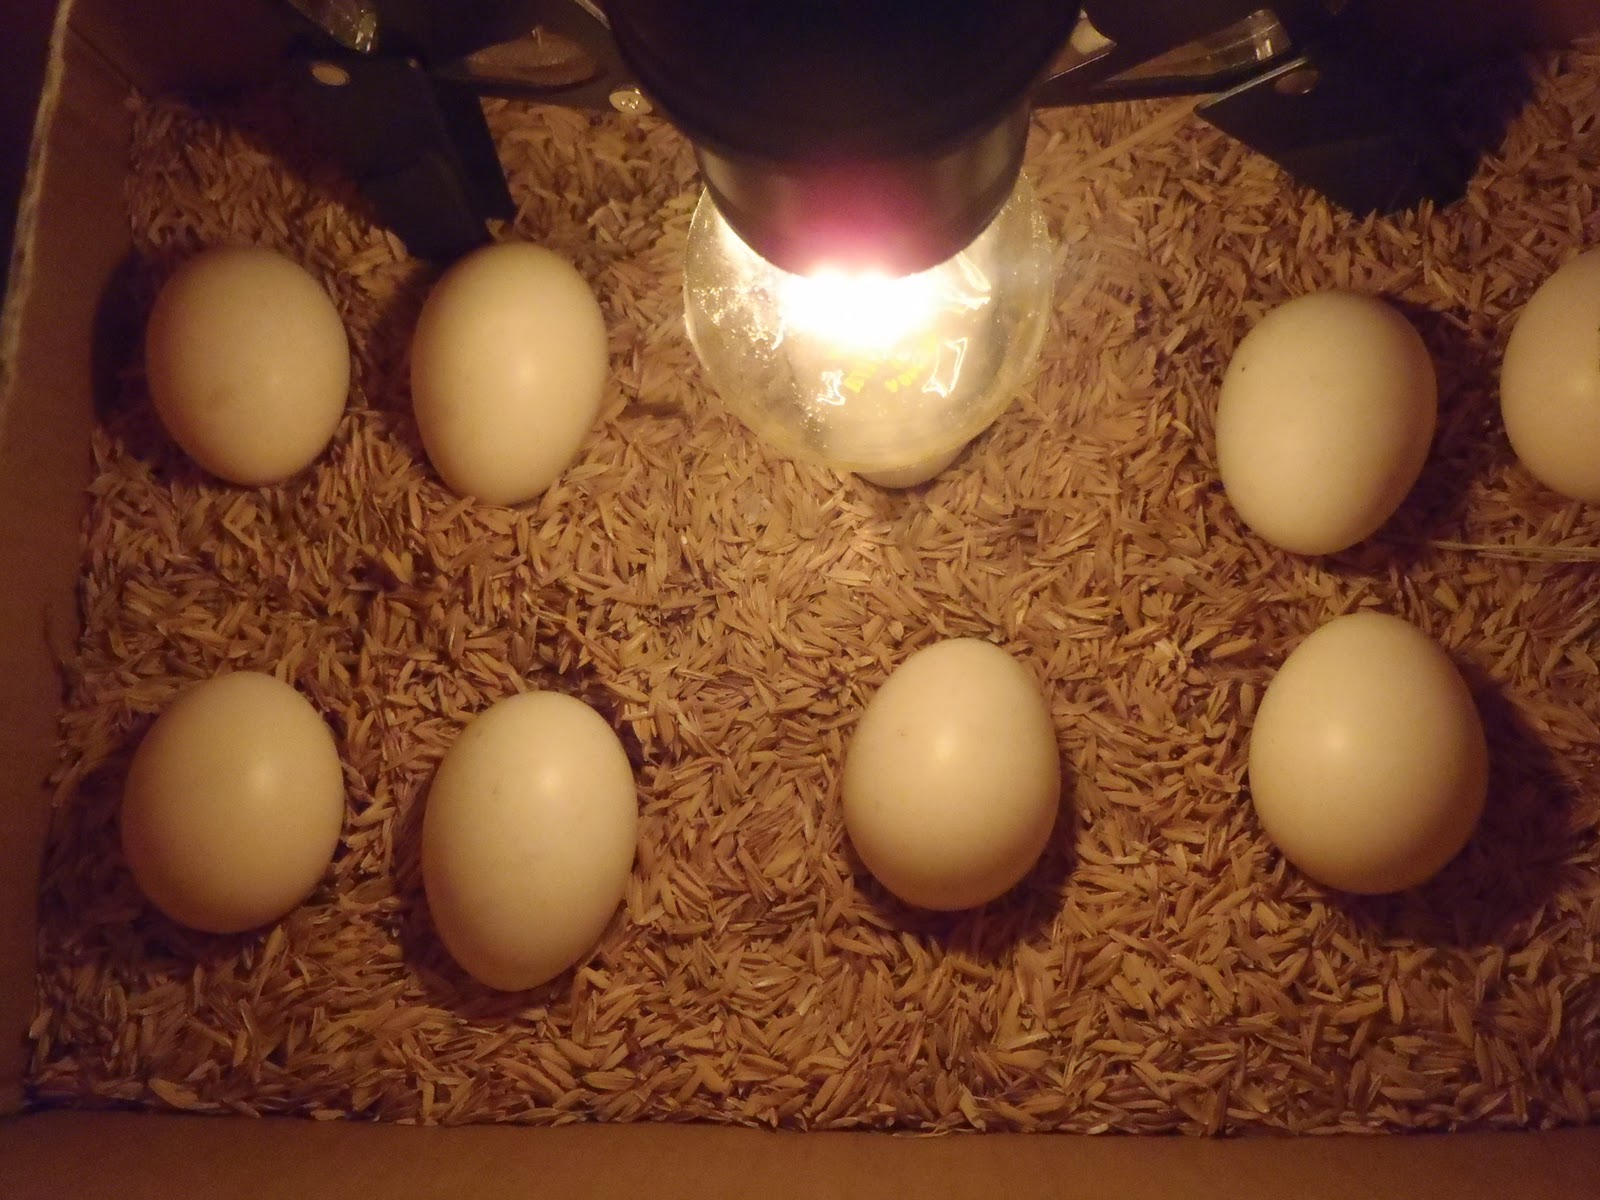 Trik Untuk Mengetahui Umur Telur Dan Cara Menentukan Kesegaran Telur Ayam